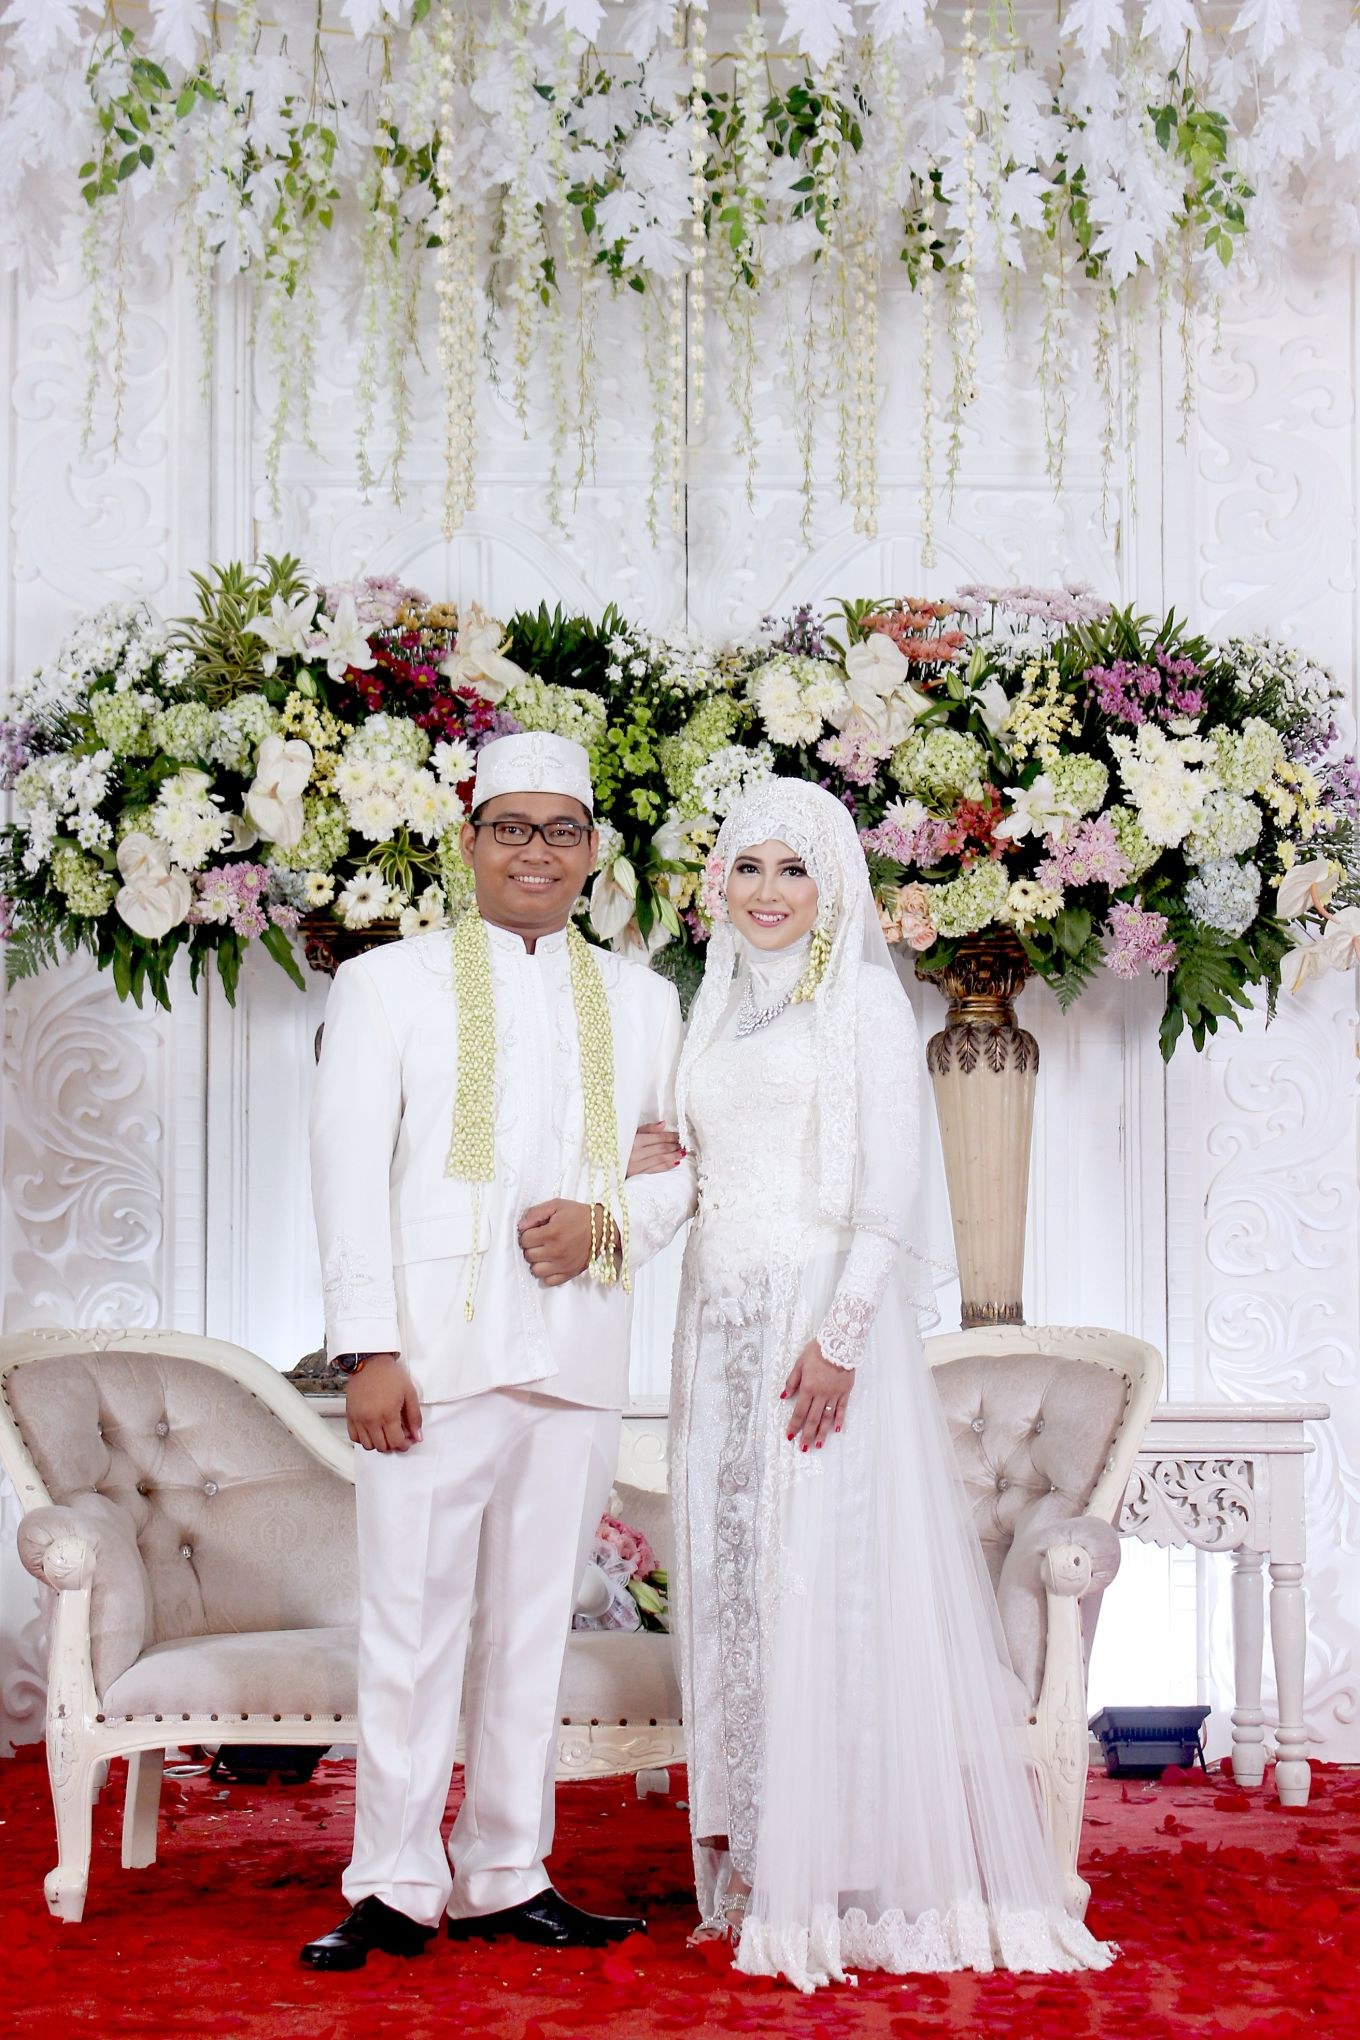 design baju pengantin adat jawa muslim 87dx ide modis baju pengantin muslim adat bugis of baju pengantin adat jawa muslim